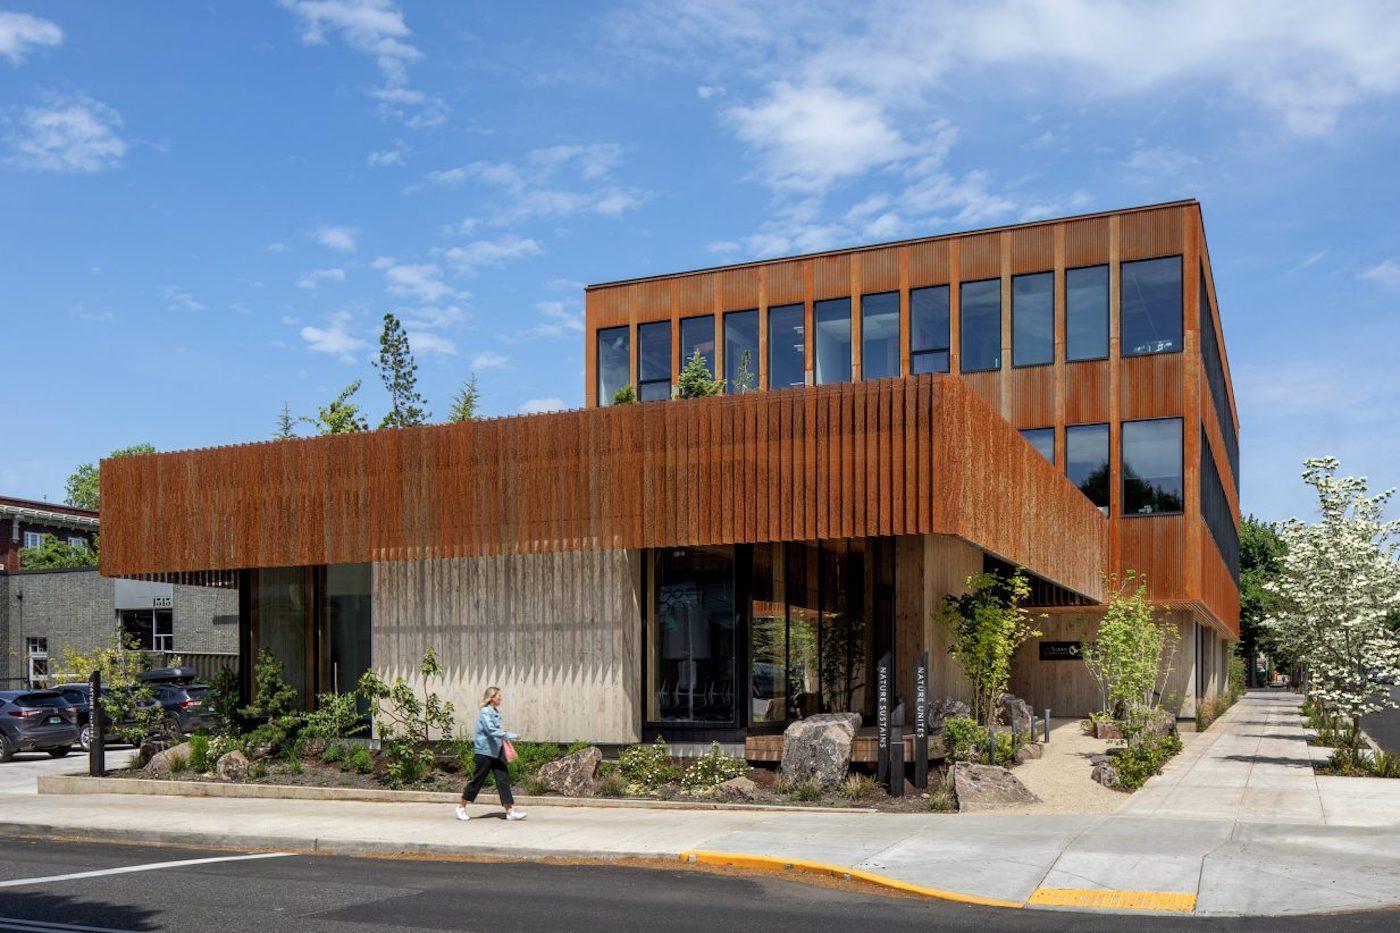 Corten steel and timber facade